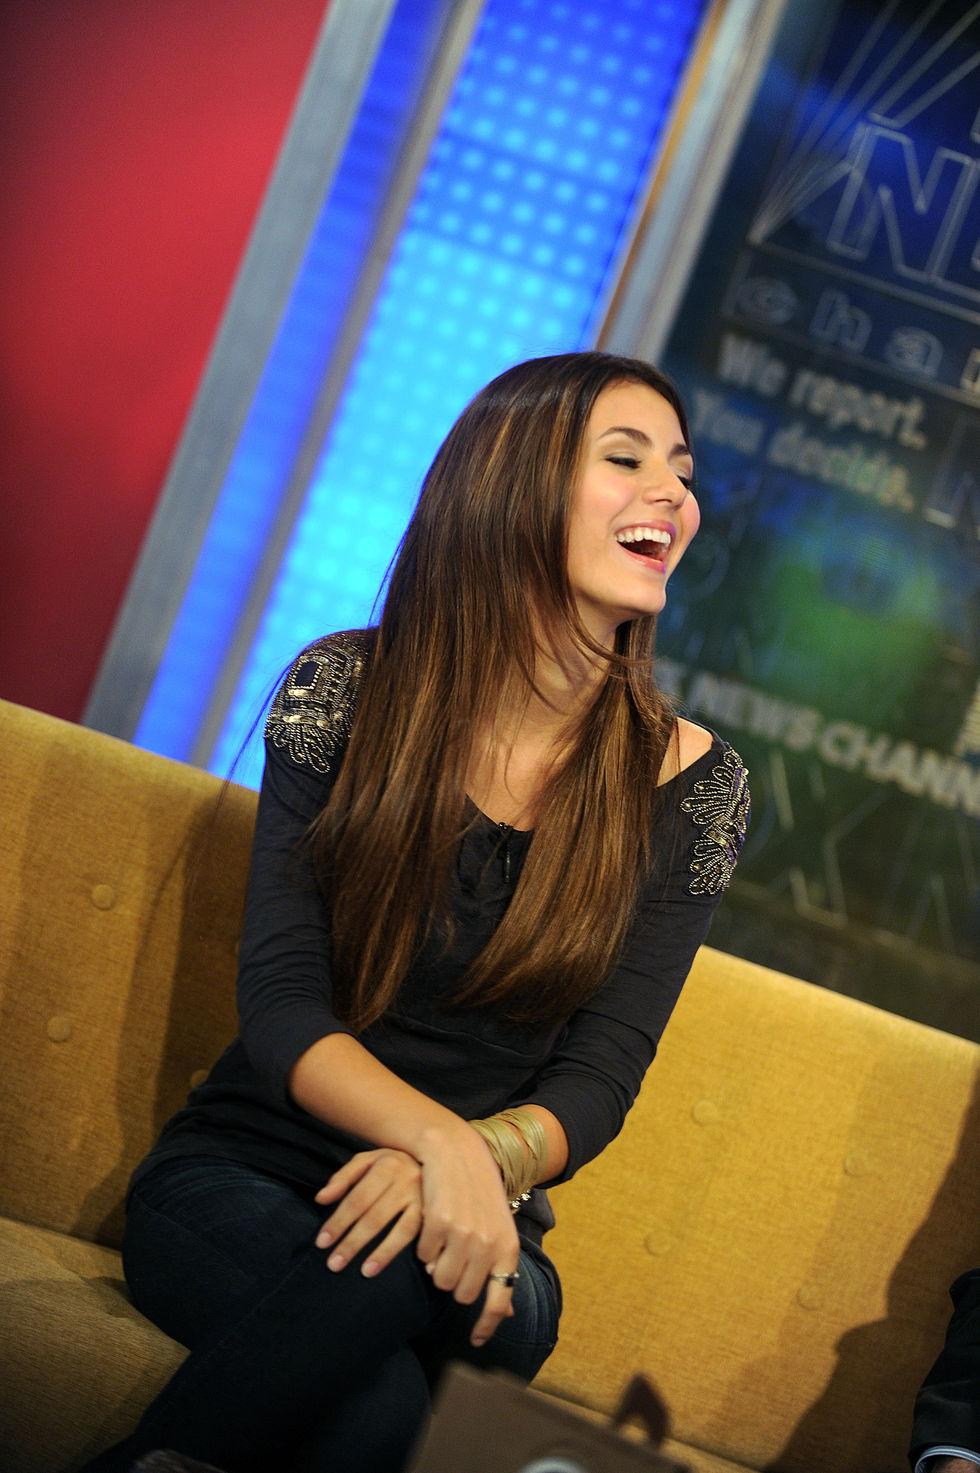 Victoria Justice At Fox News Studios In Ny Sep 29 2010